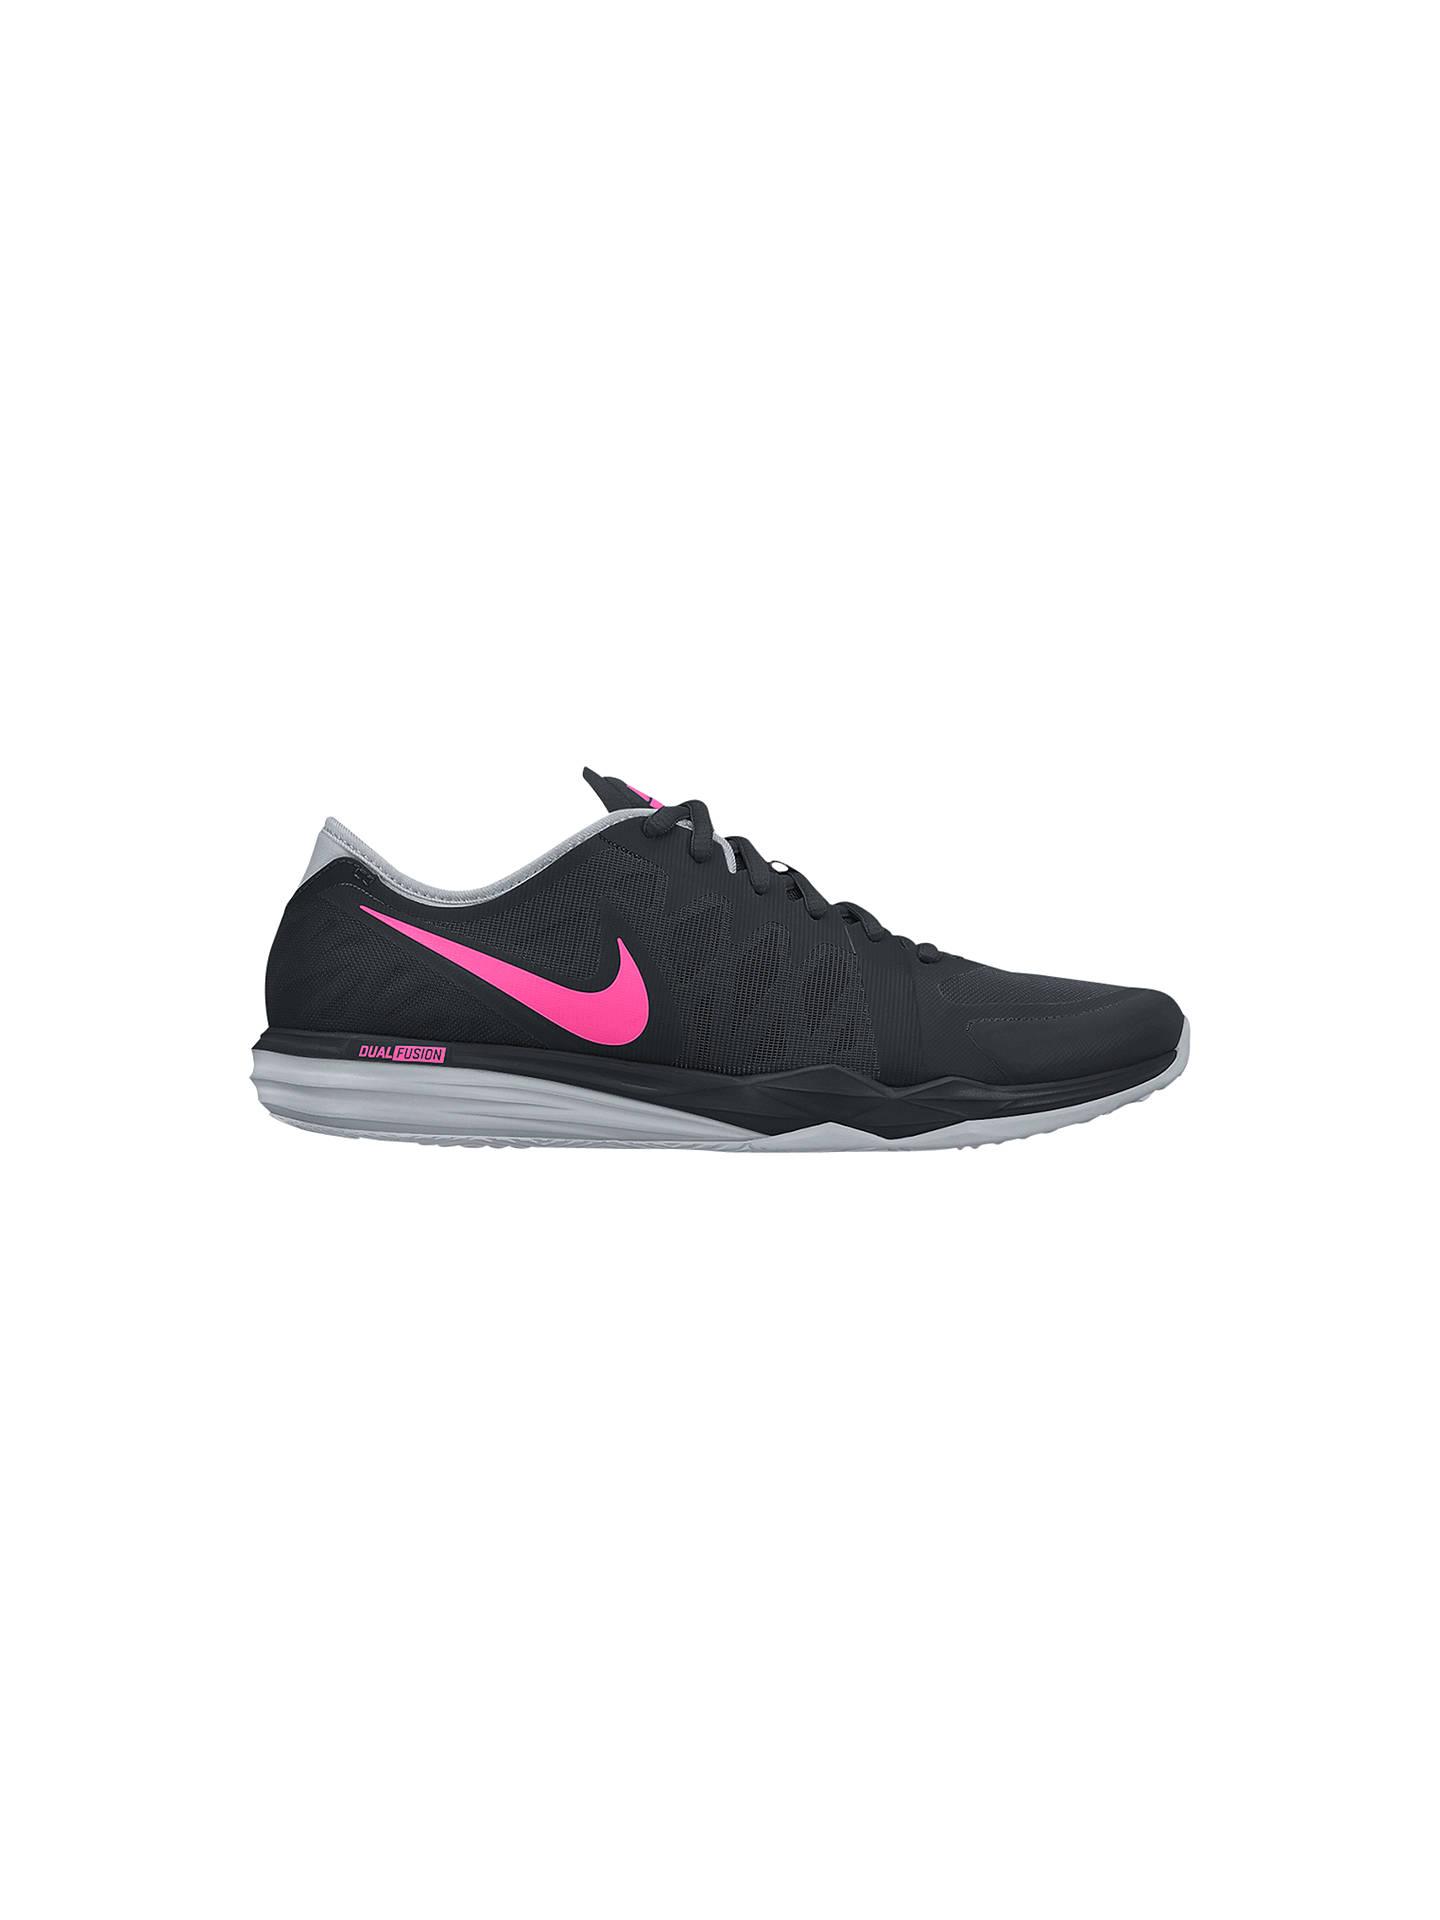 wholesale dealer 4872c f27d8 Buy Nike Dual Fusion TR3 Women s Cross Trainers, Black Pink, 4 Online at ...